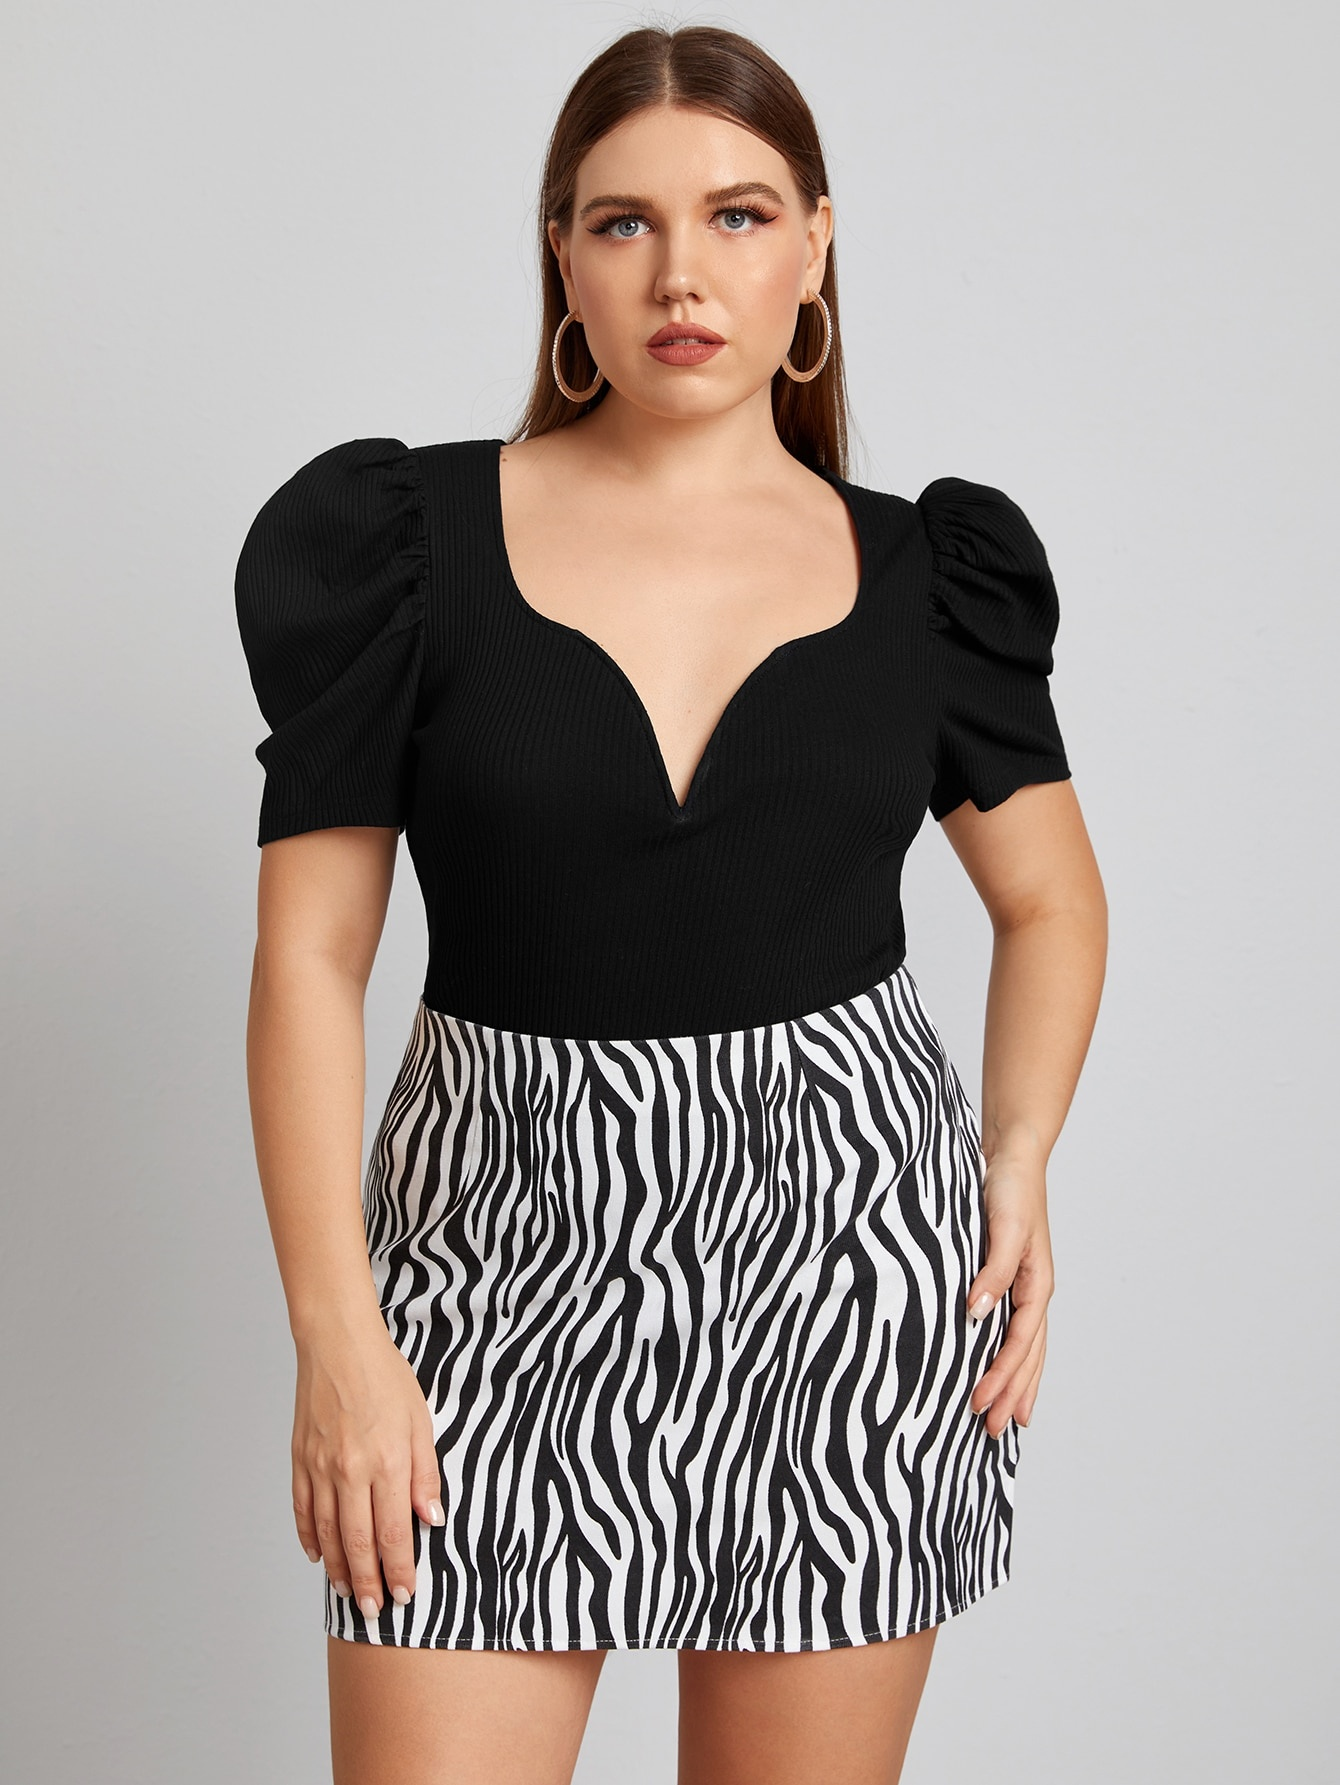 Blusas shein tallas grandes